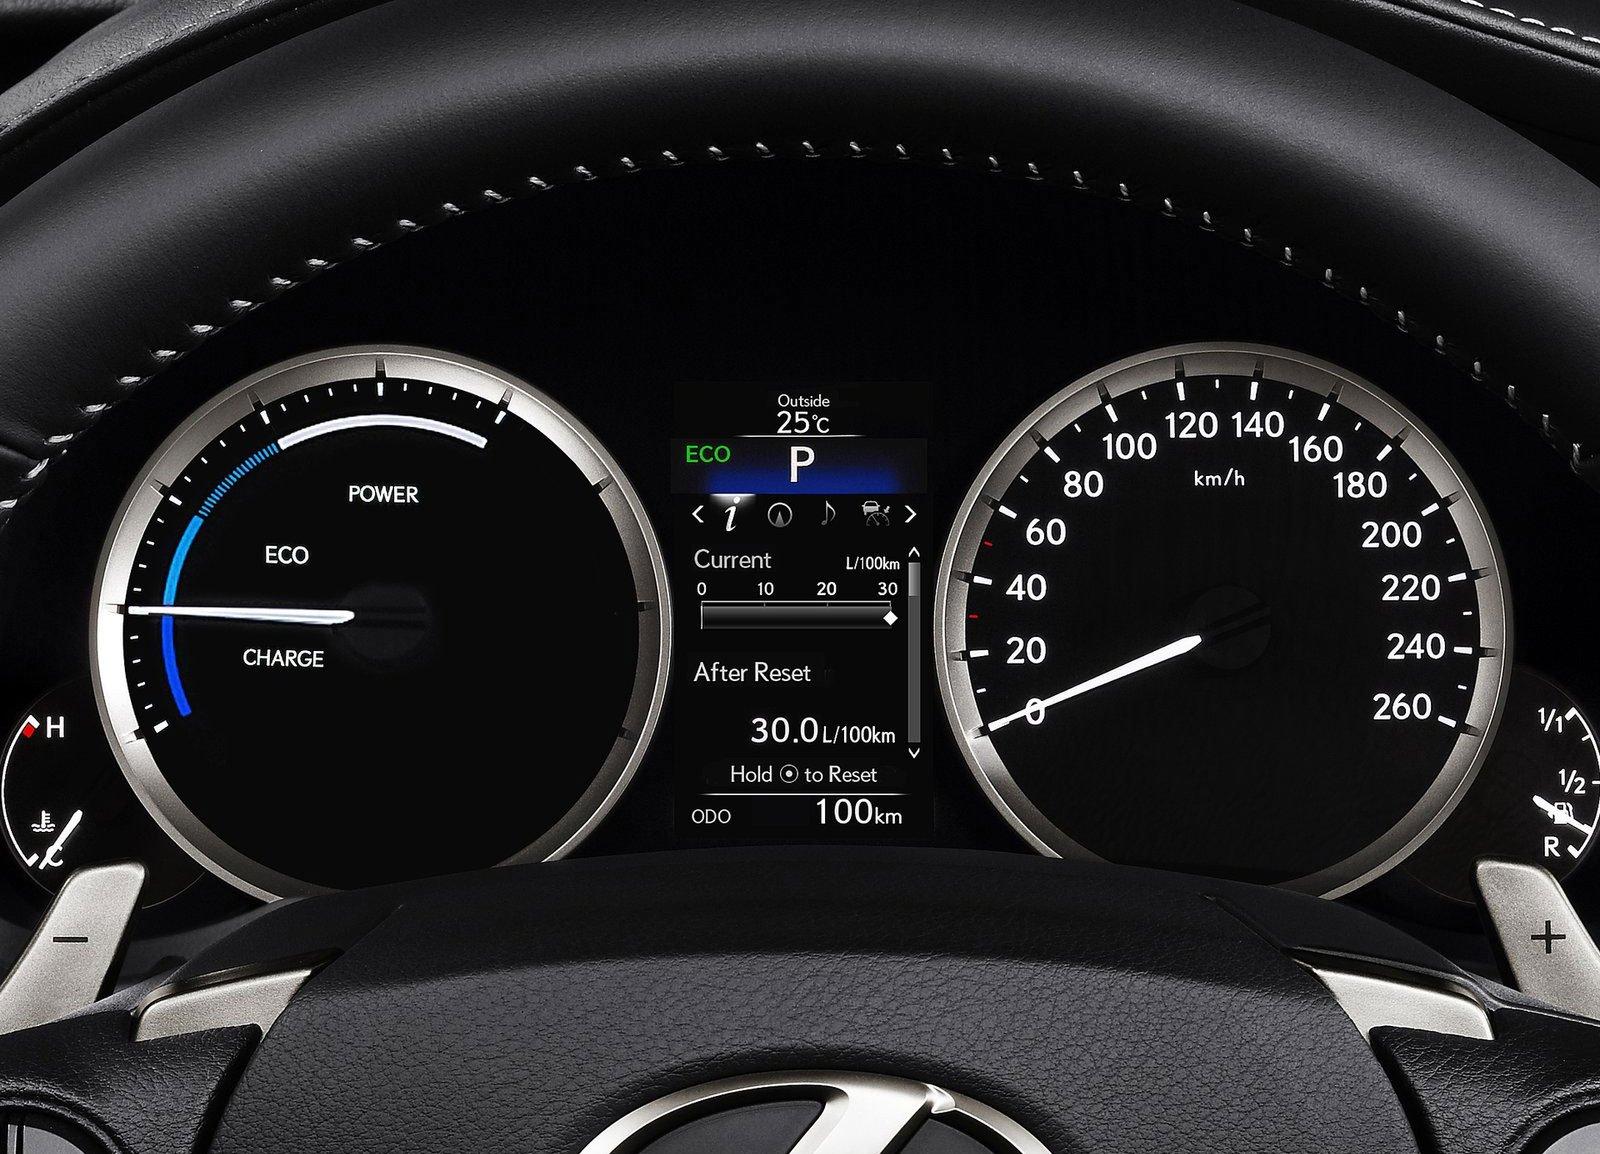 New 2014 Lexus IS Officially Revealed U2013 IS 250, IS 350, F Sport,